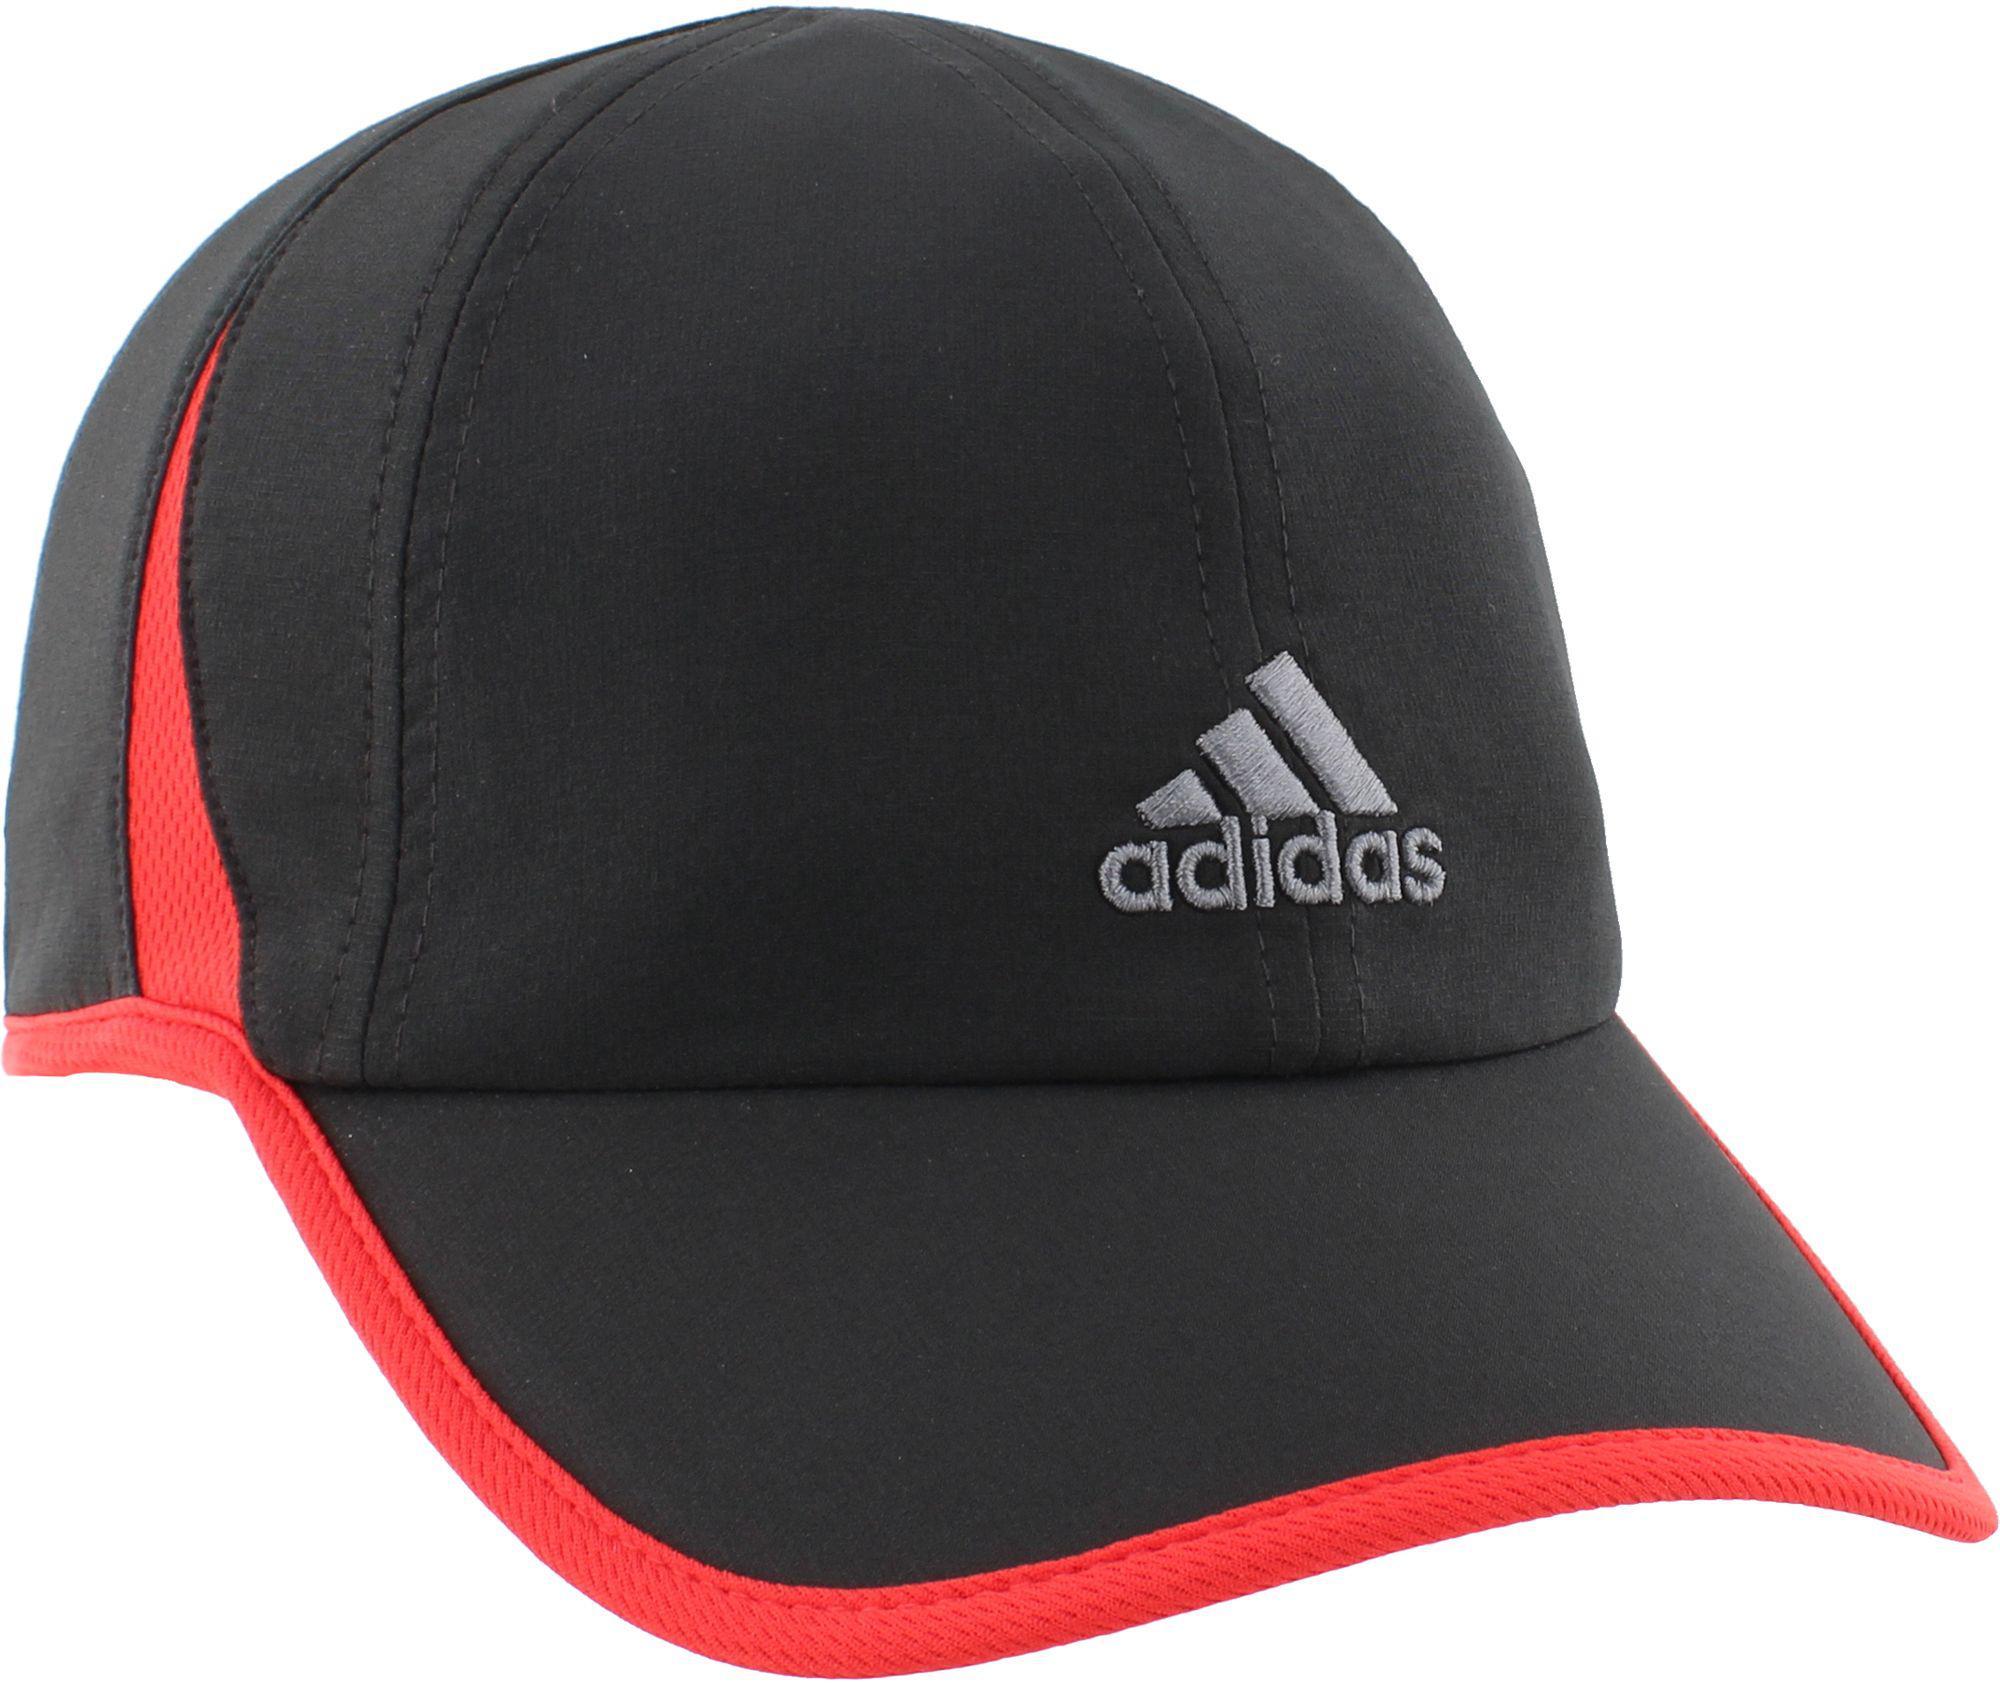 196da9e55a6 Lyst - adidas Adizero Adjustable Cap in Black for Men